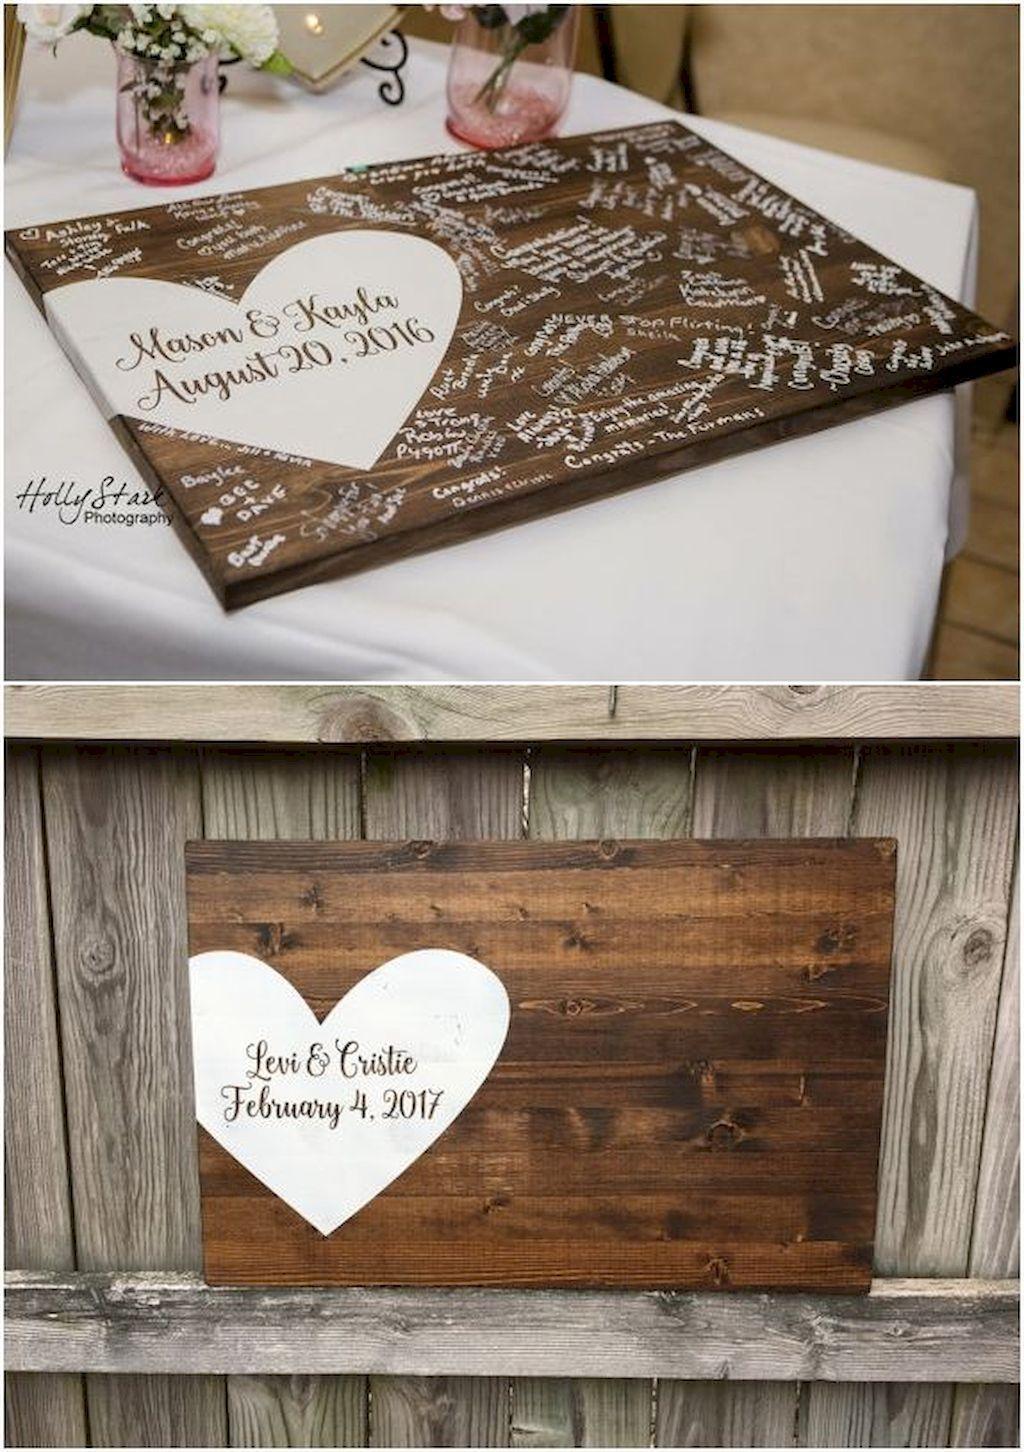 47 Unique Wedding Guest Book Ideas Weddingideas Wedding Guest Book Sign Wood Guest Book Wedding Wedding Guest Book Unique